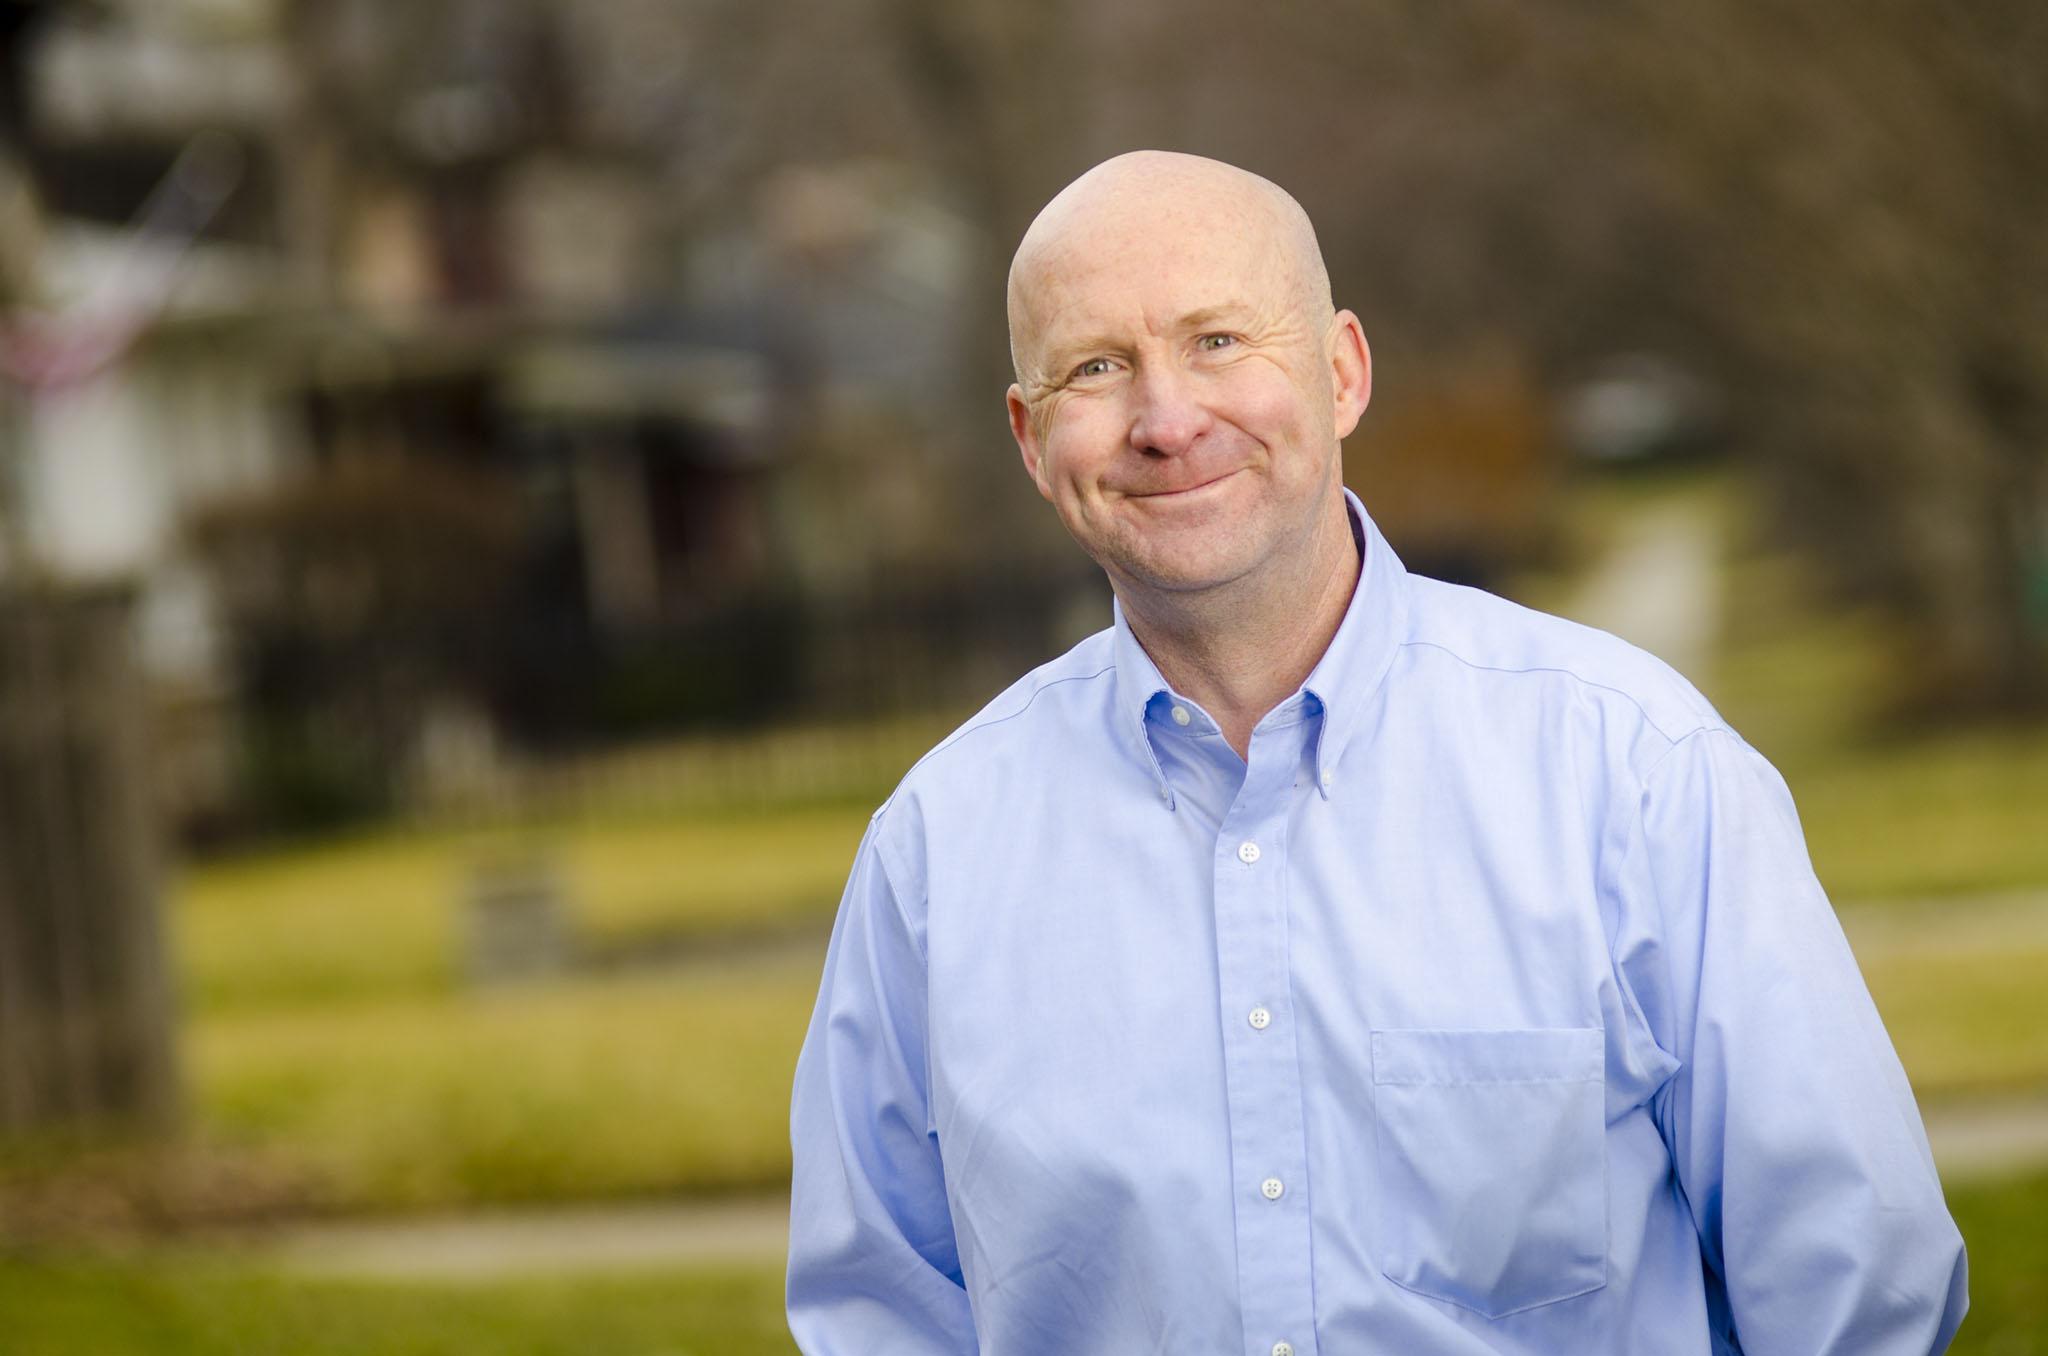 Radiation oncologist Kevin McMullen MD